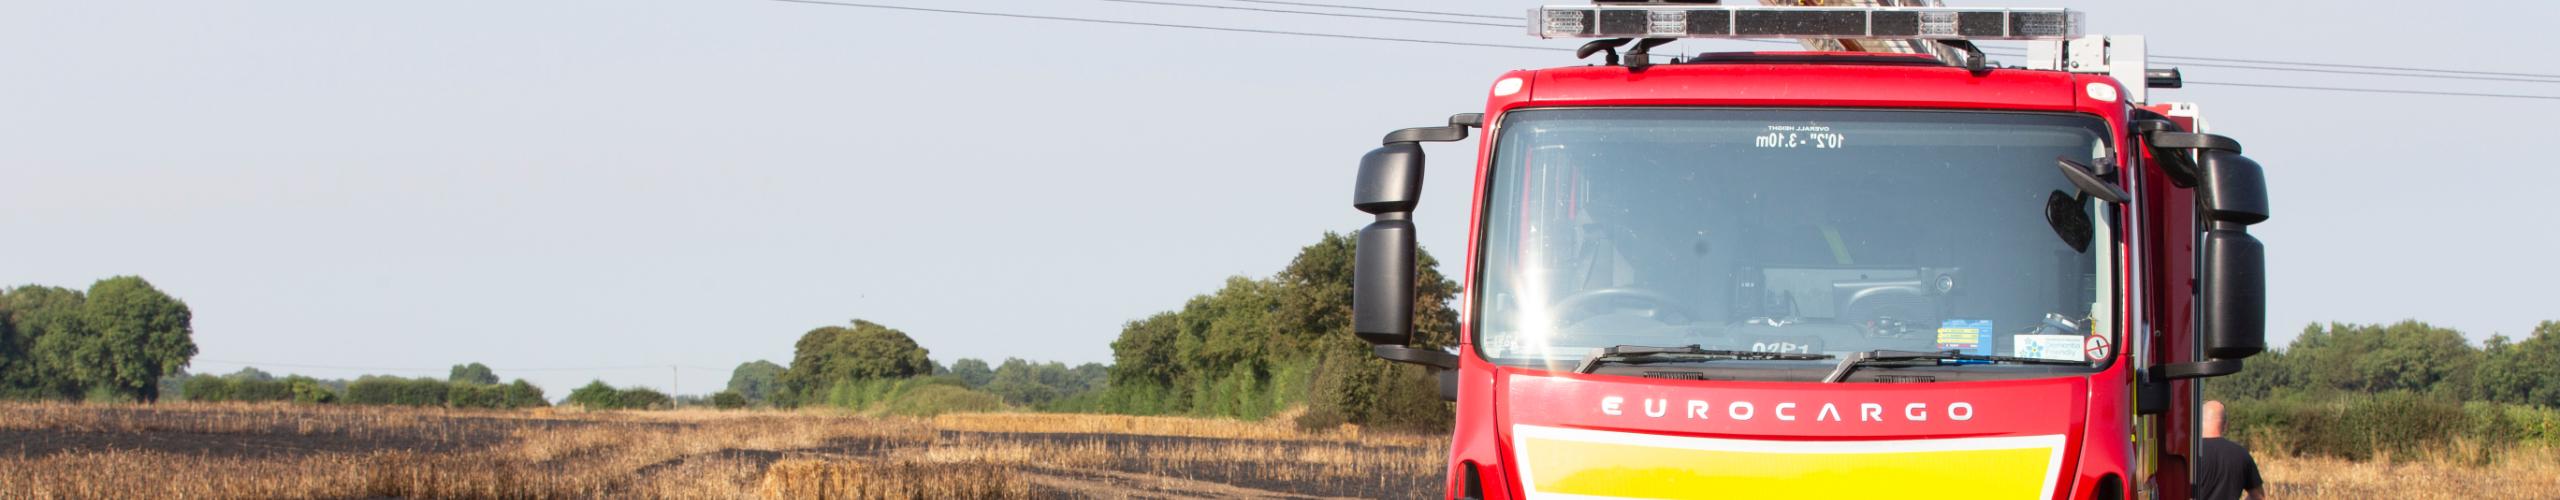 Kent Fire & Rescue Service fire engine in a field